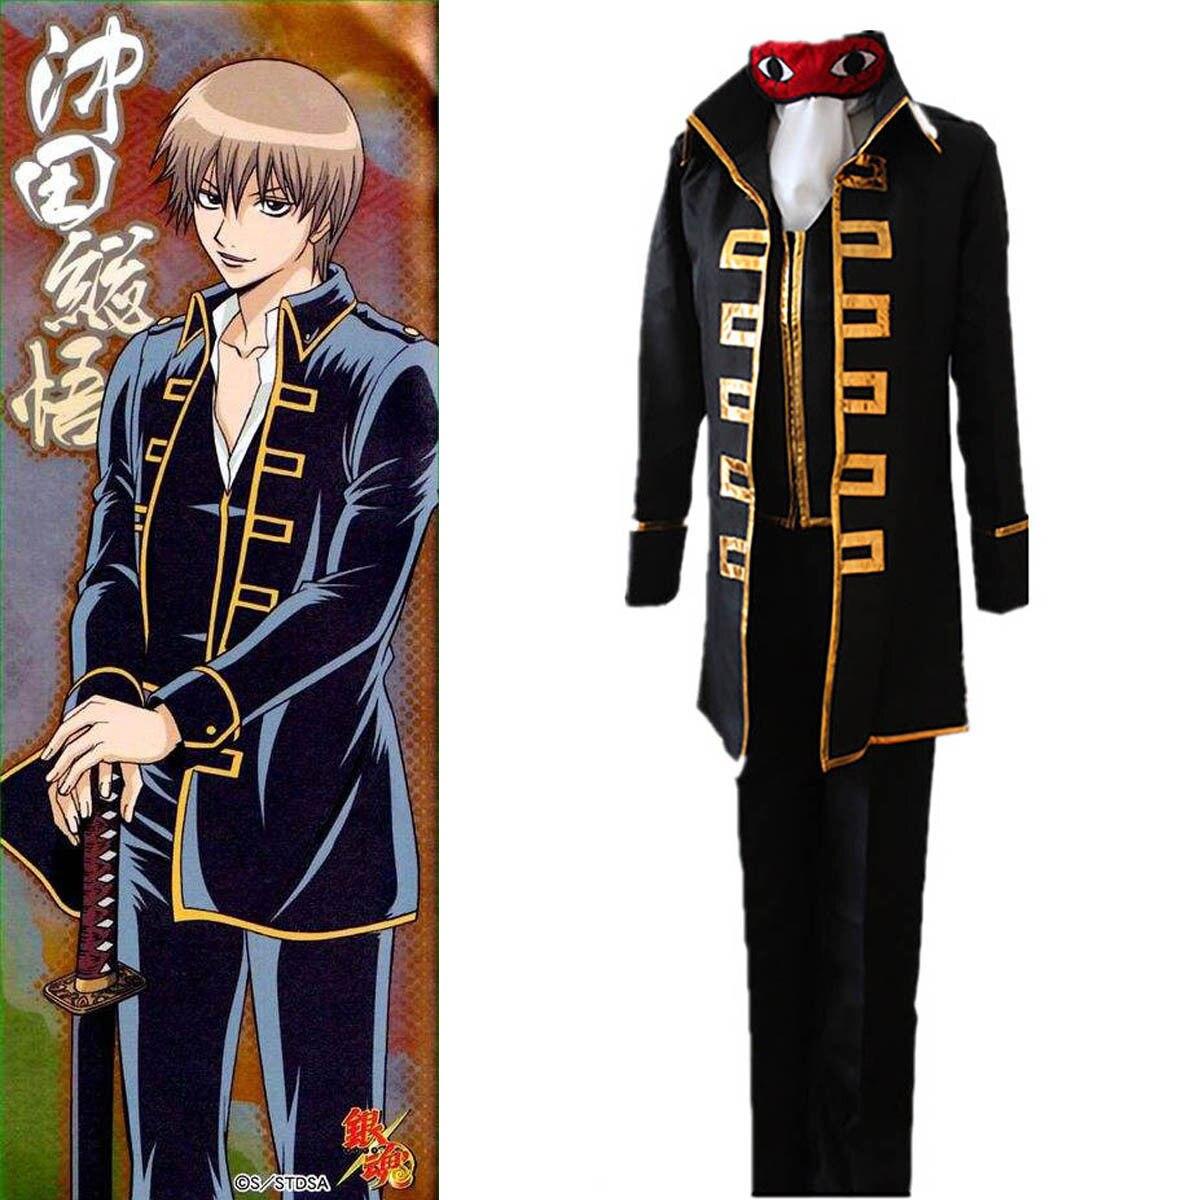 Tokyo Anime Gintama Shinsengumi équipe Cosplay Costume argent âme Okita Sougo costumes Anime fête spectacle Coser